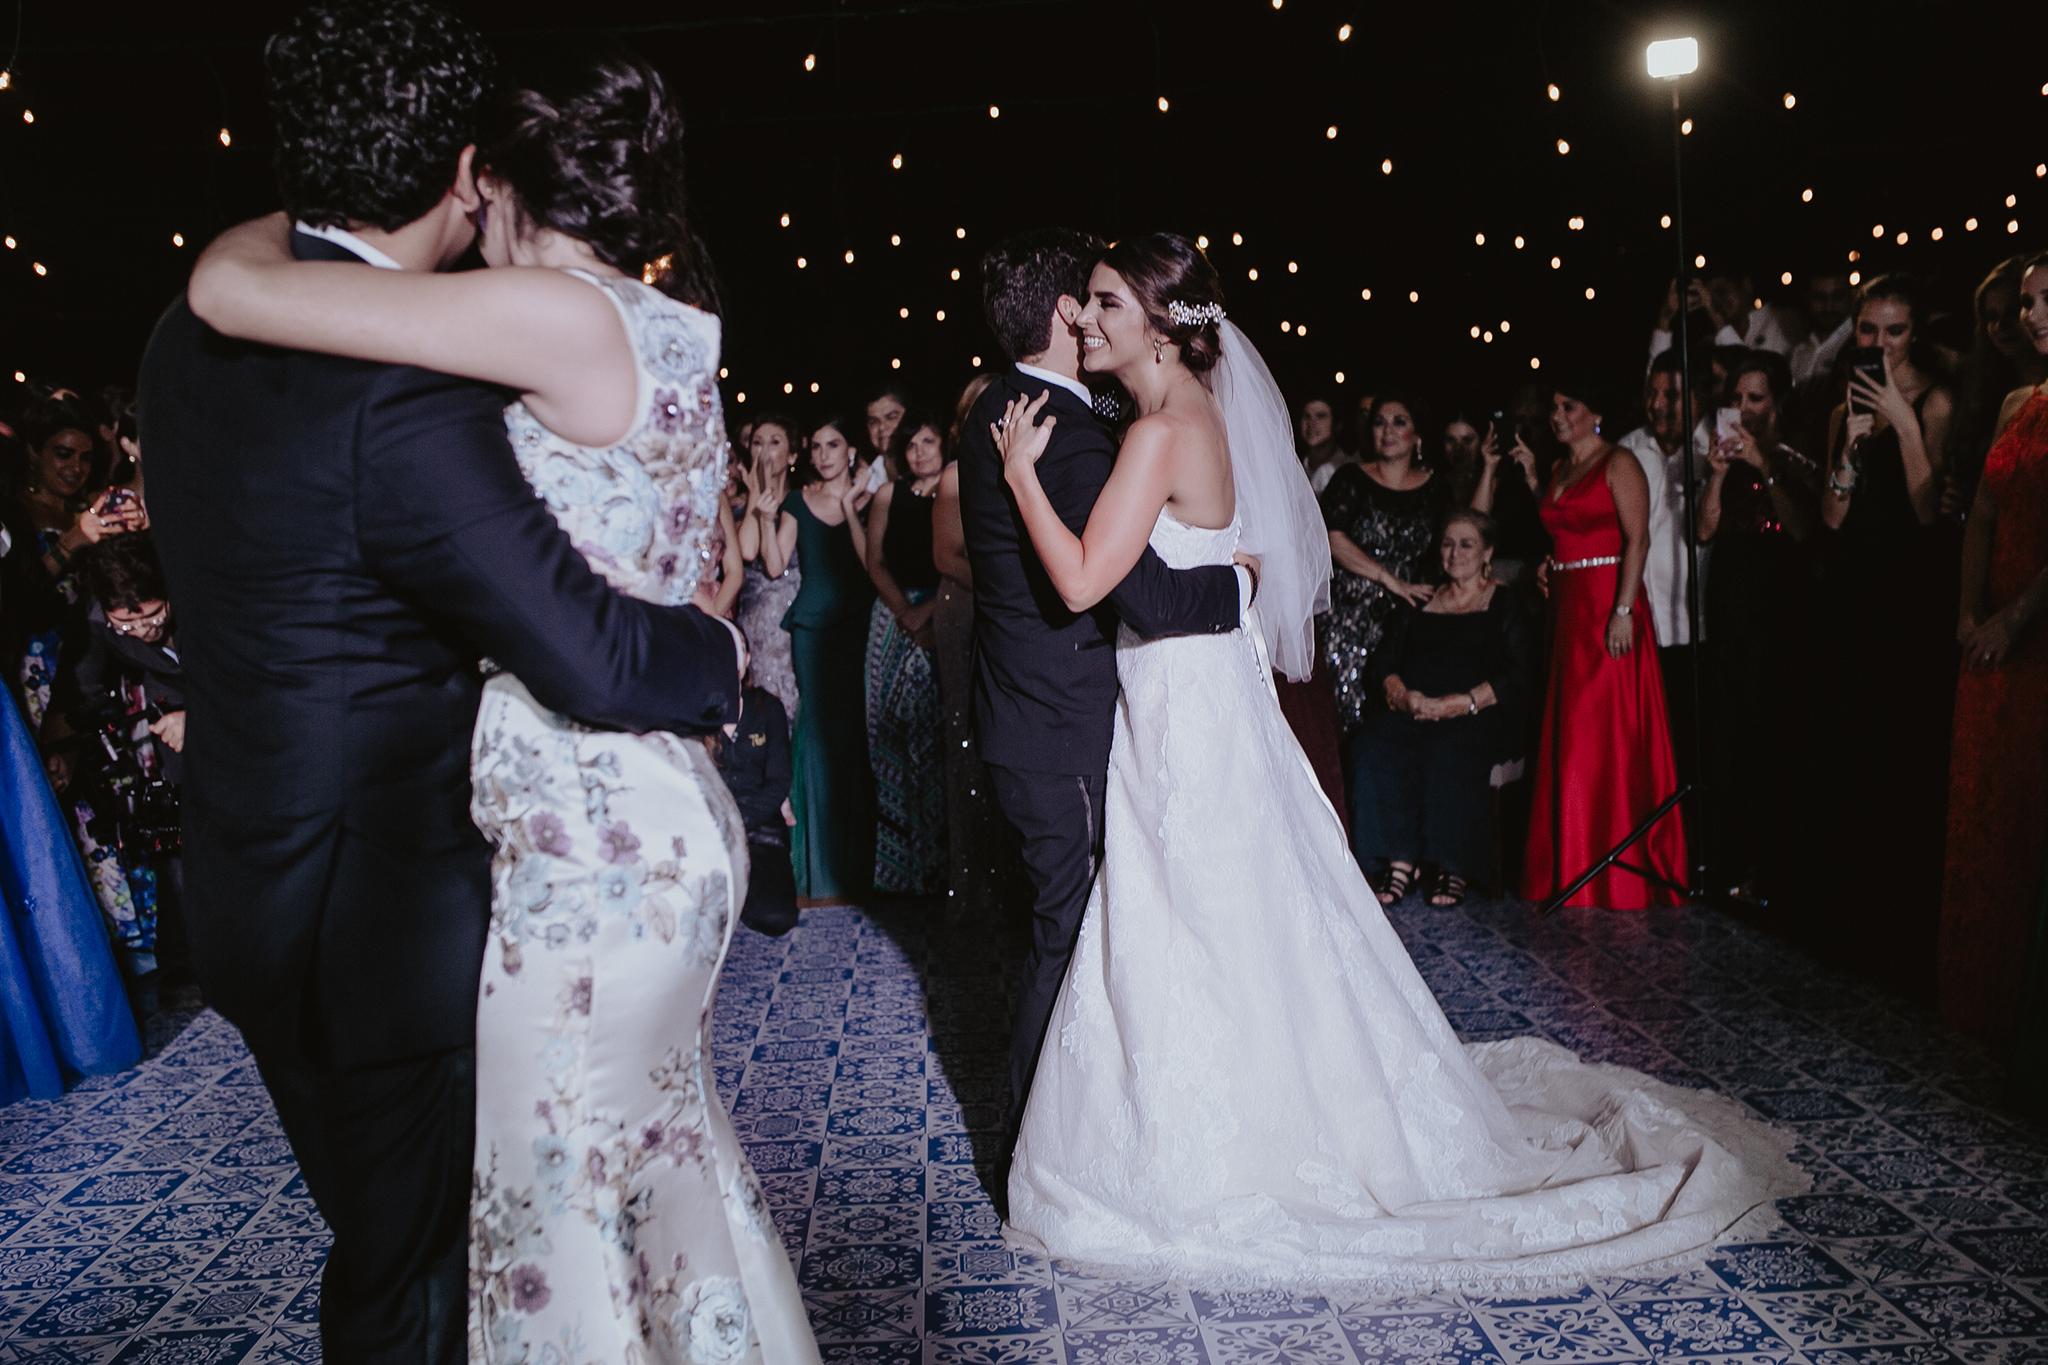 0308F&Yslide_WeddingDstination_MeridaYucatan_HaciendasMerida_BodasMexico_BodasYucatan_Boda_Destino.jpg